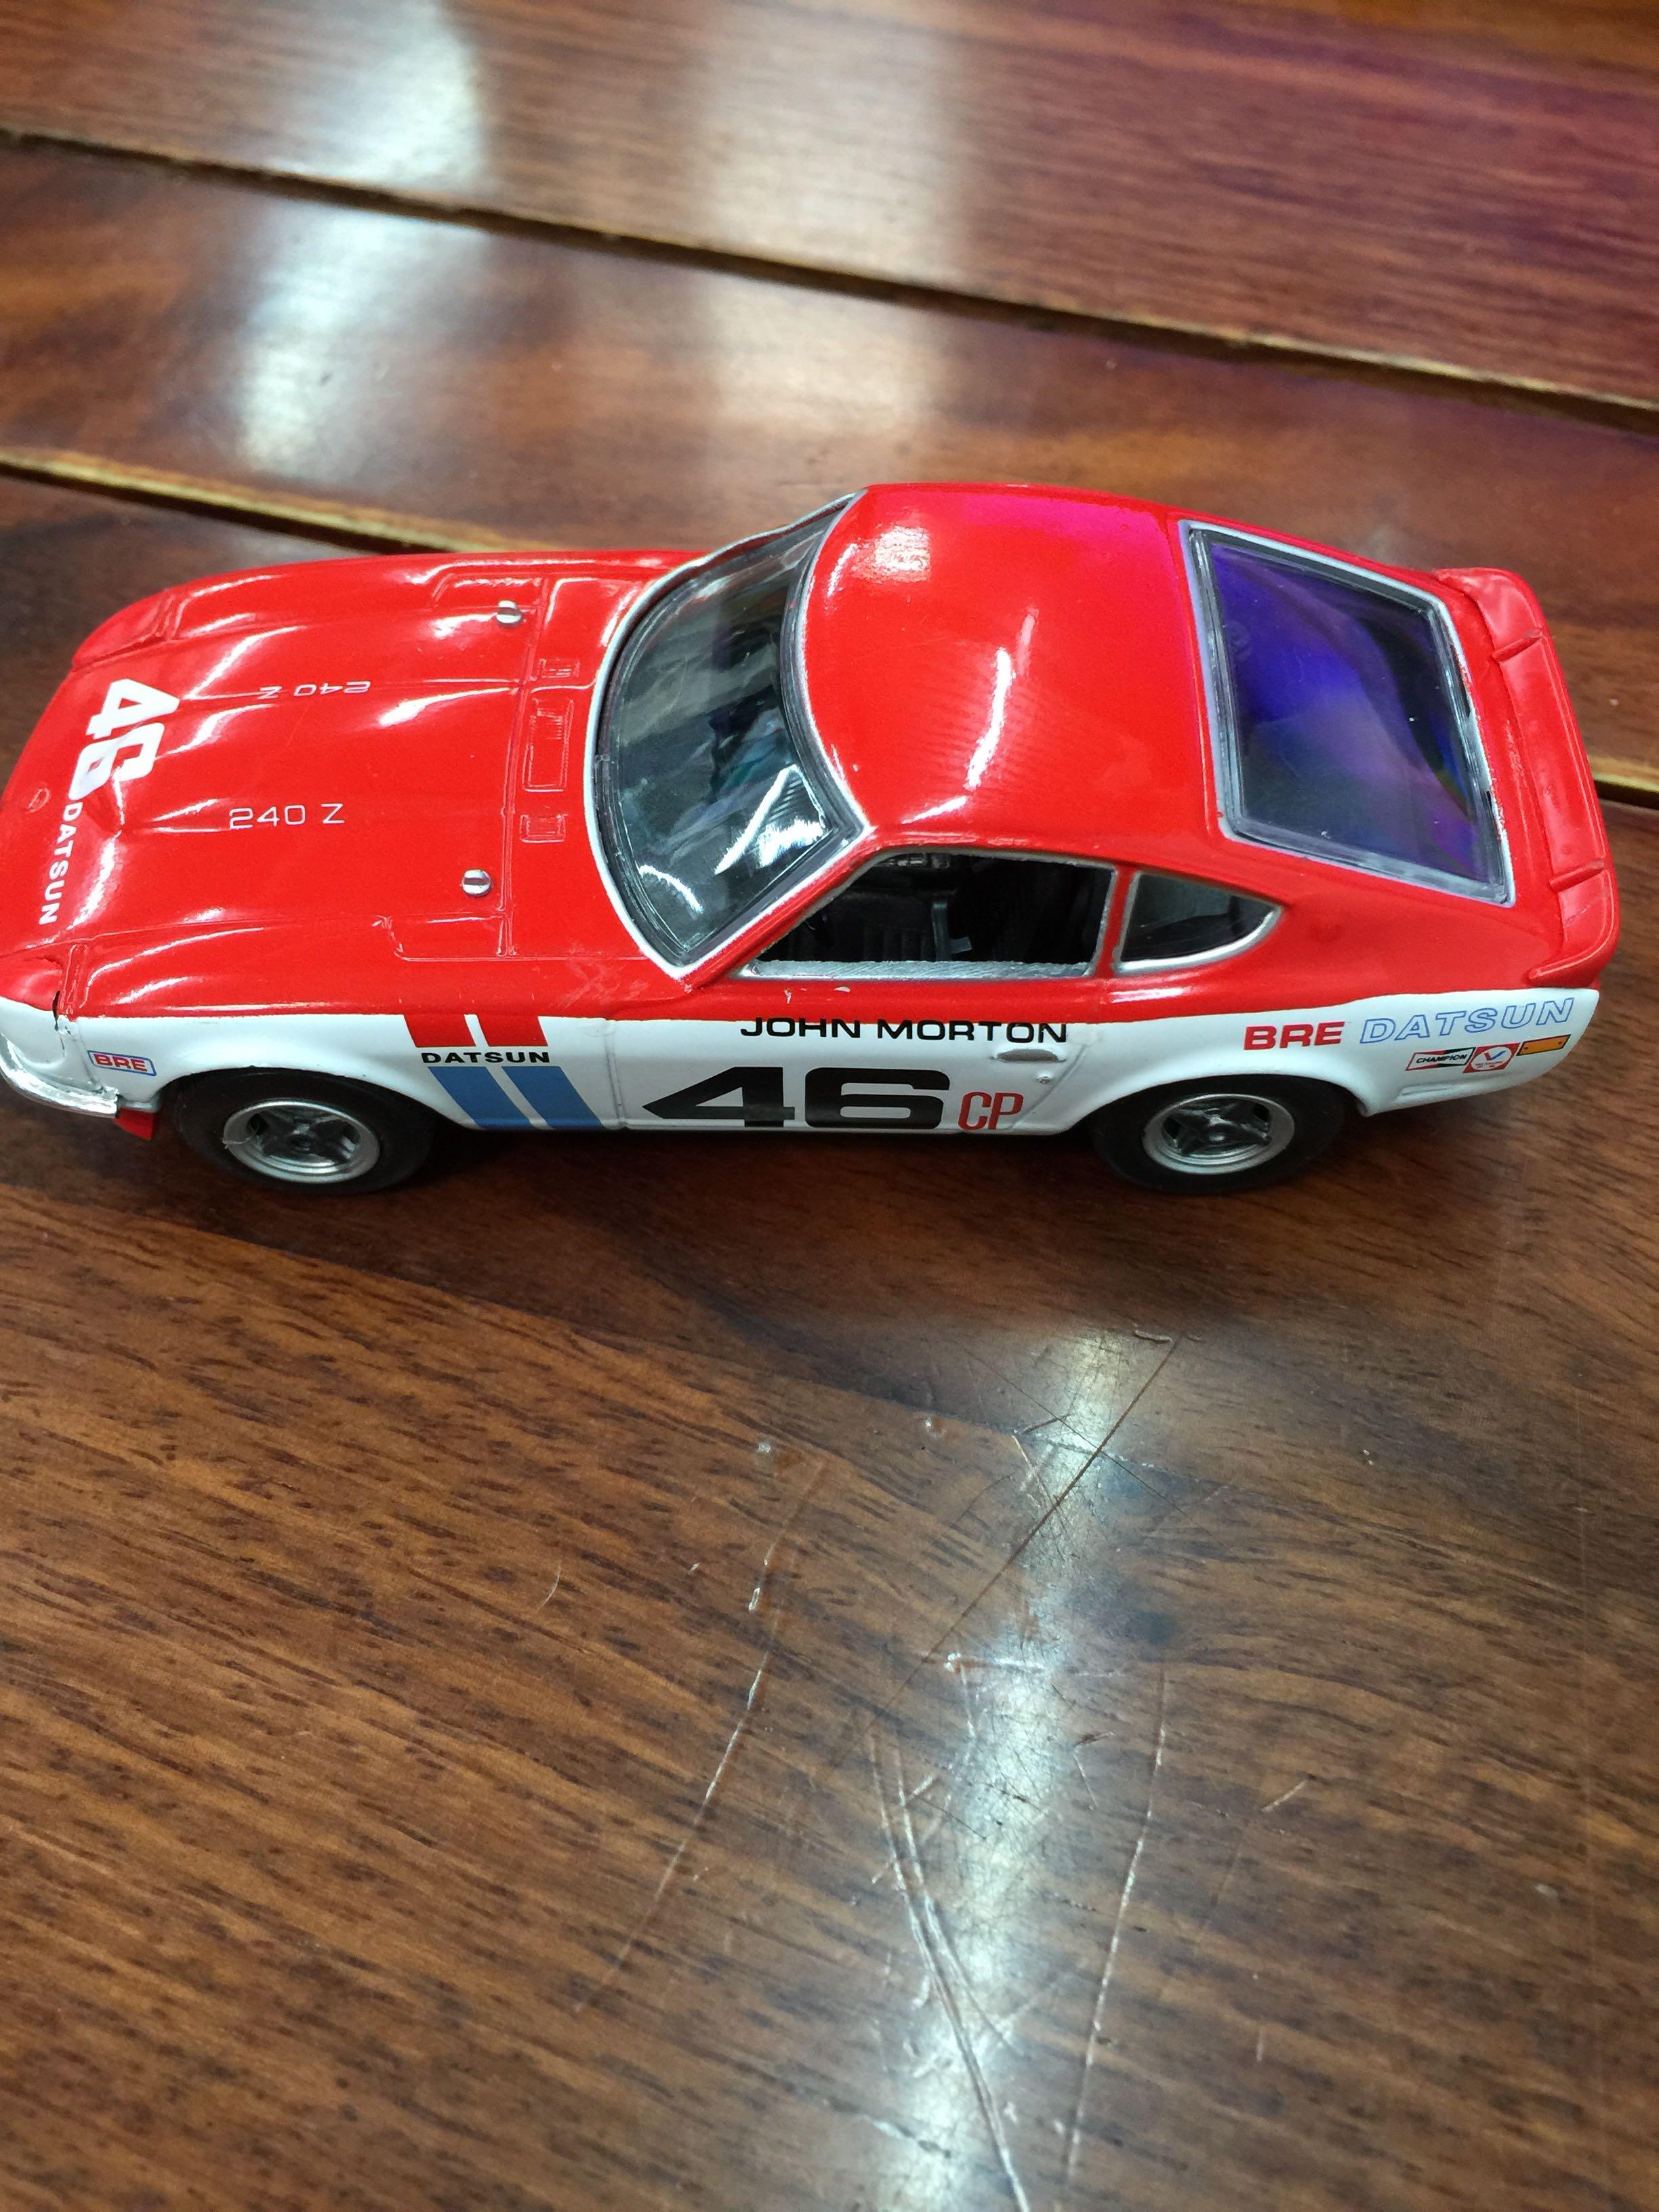 Delprado 1/43 Scale Racing Car Toys 1970 BRE DATSUN 240Z JOHN MORTON Diecast Metal Car Model Toy For Gift/Kids/Collection